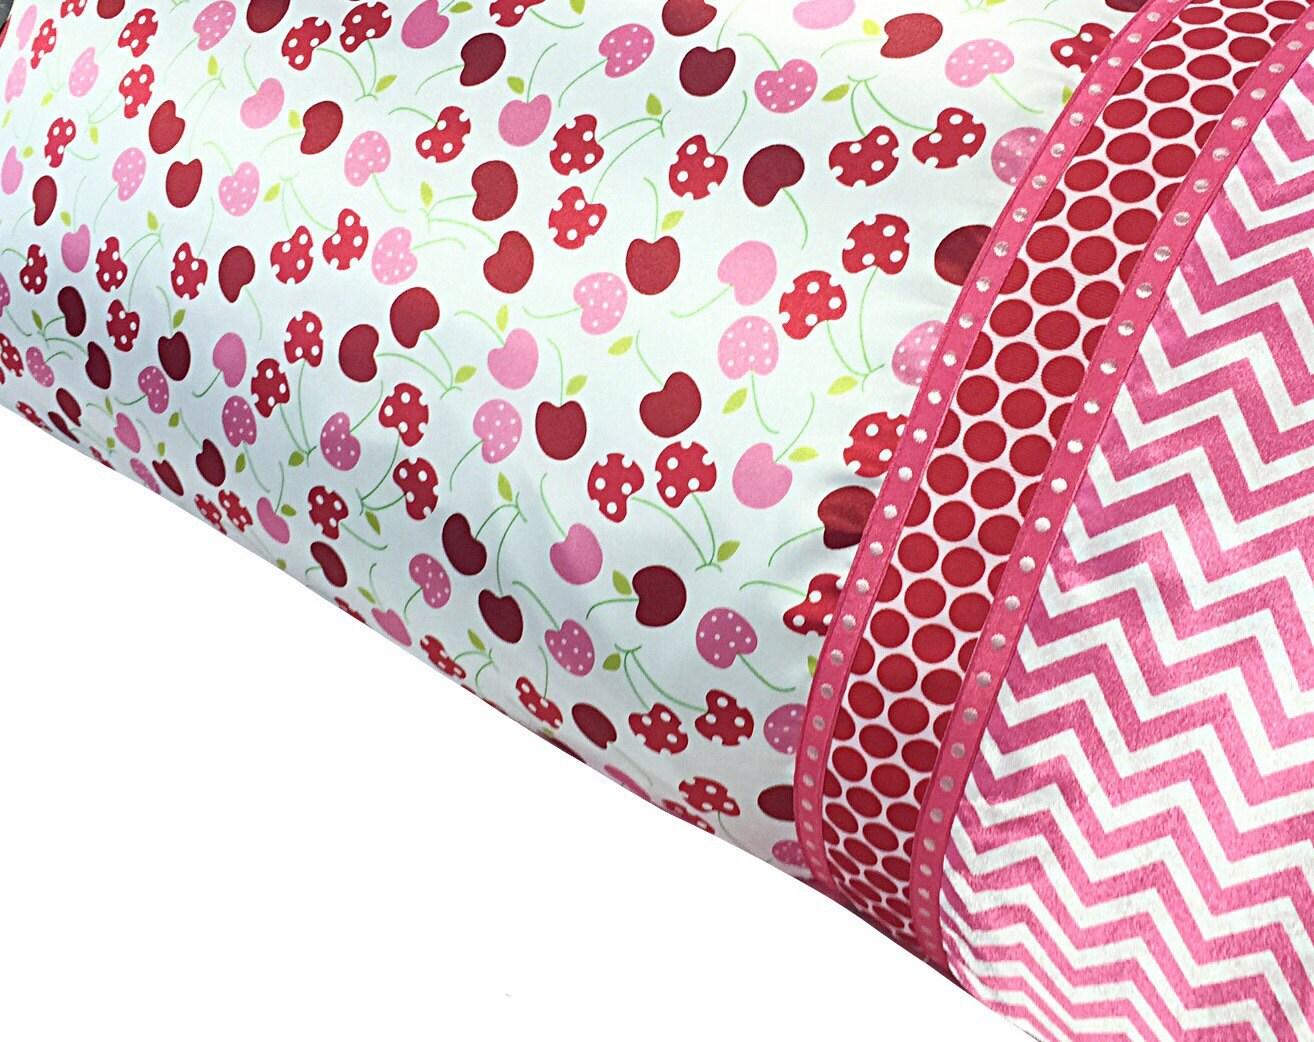 Satin Pillowcase Cherry Amp Chevron Print Red Pink Hot